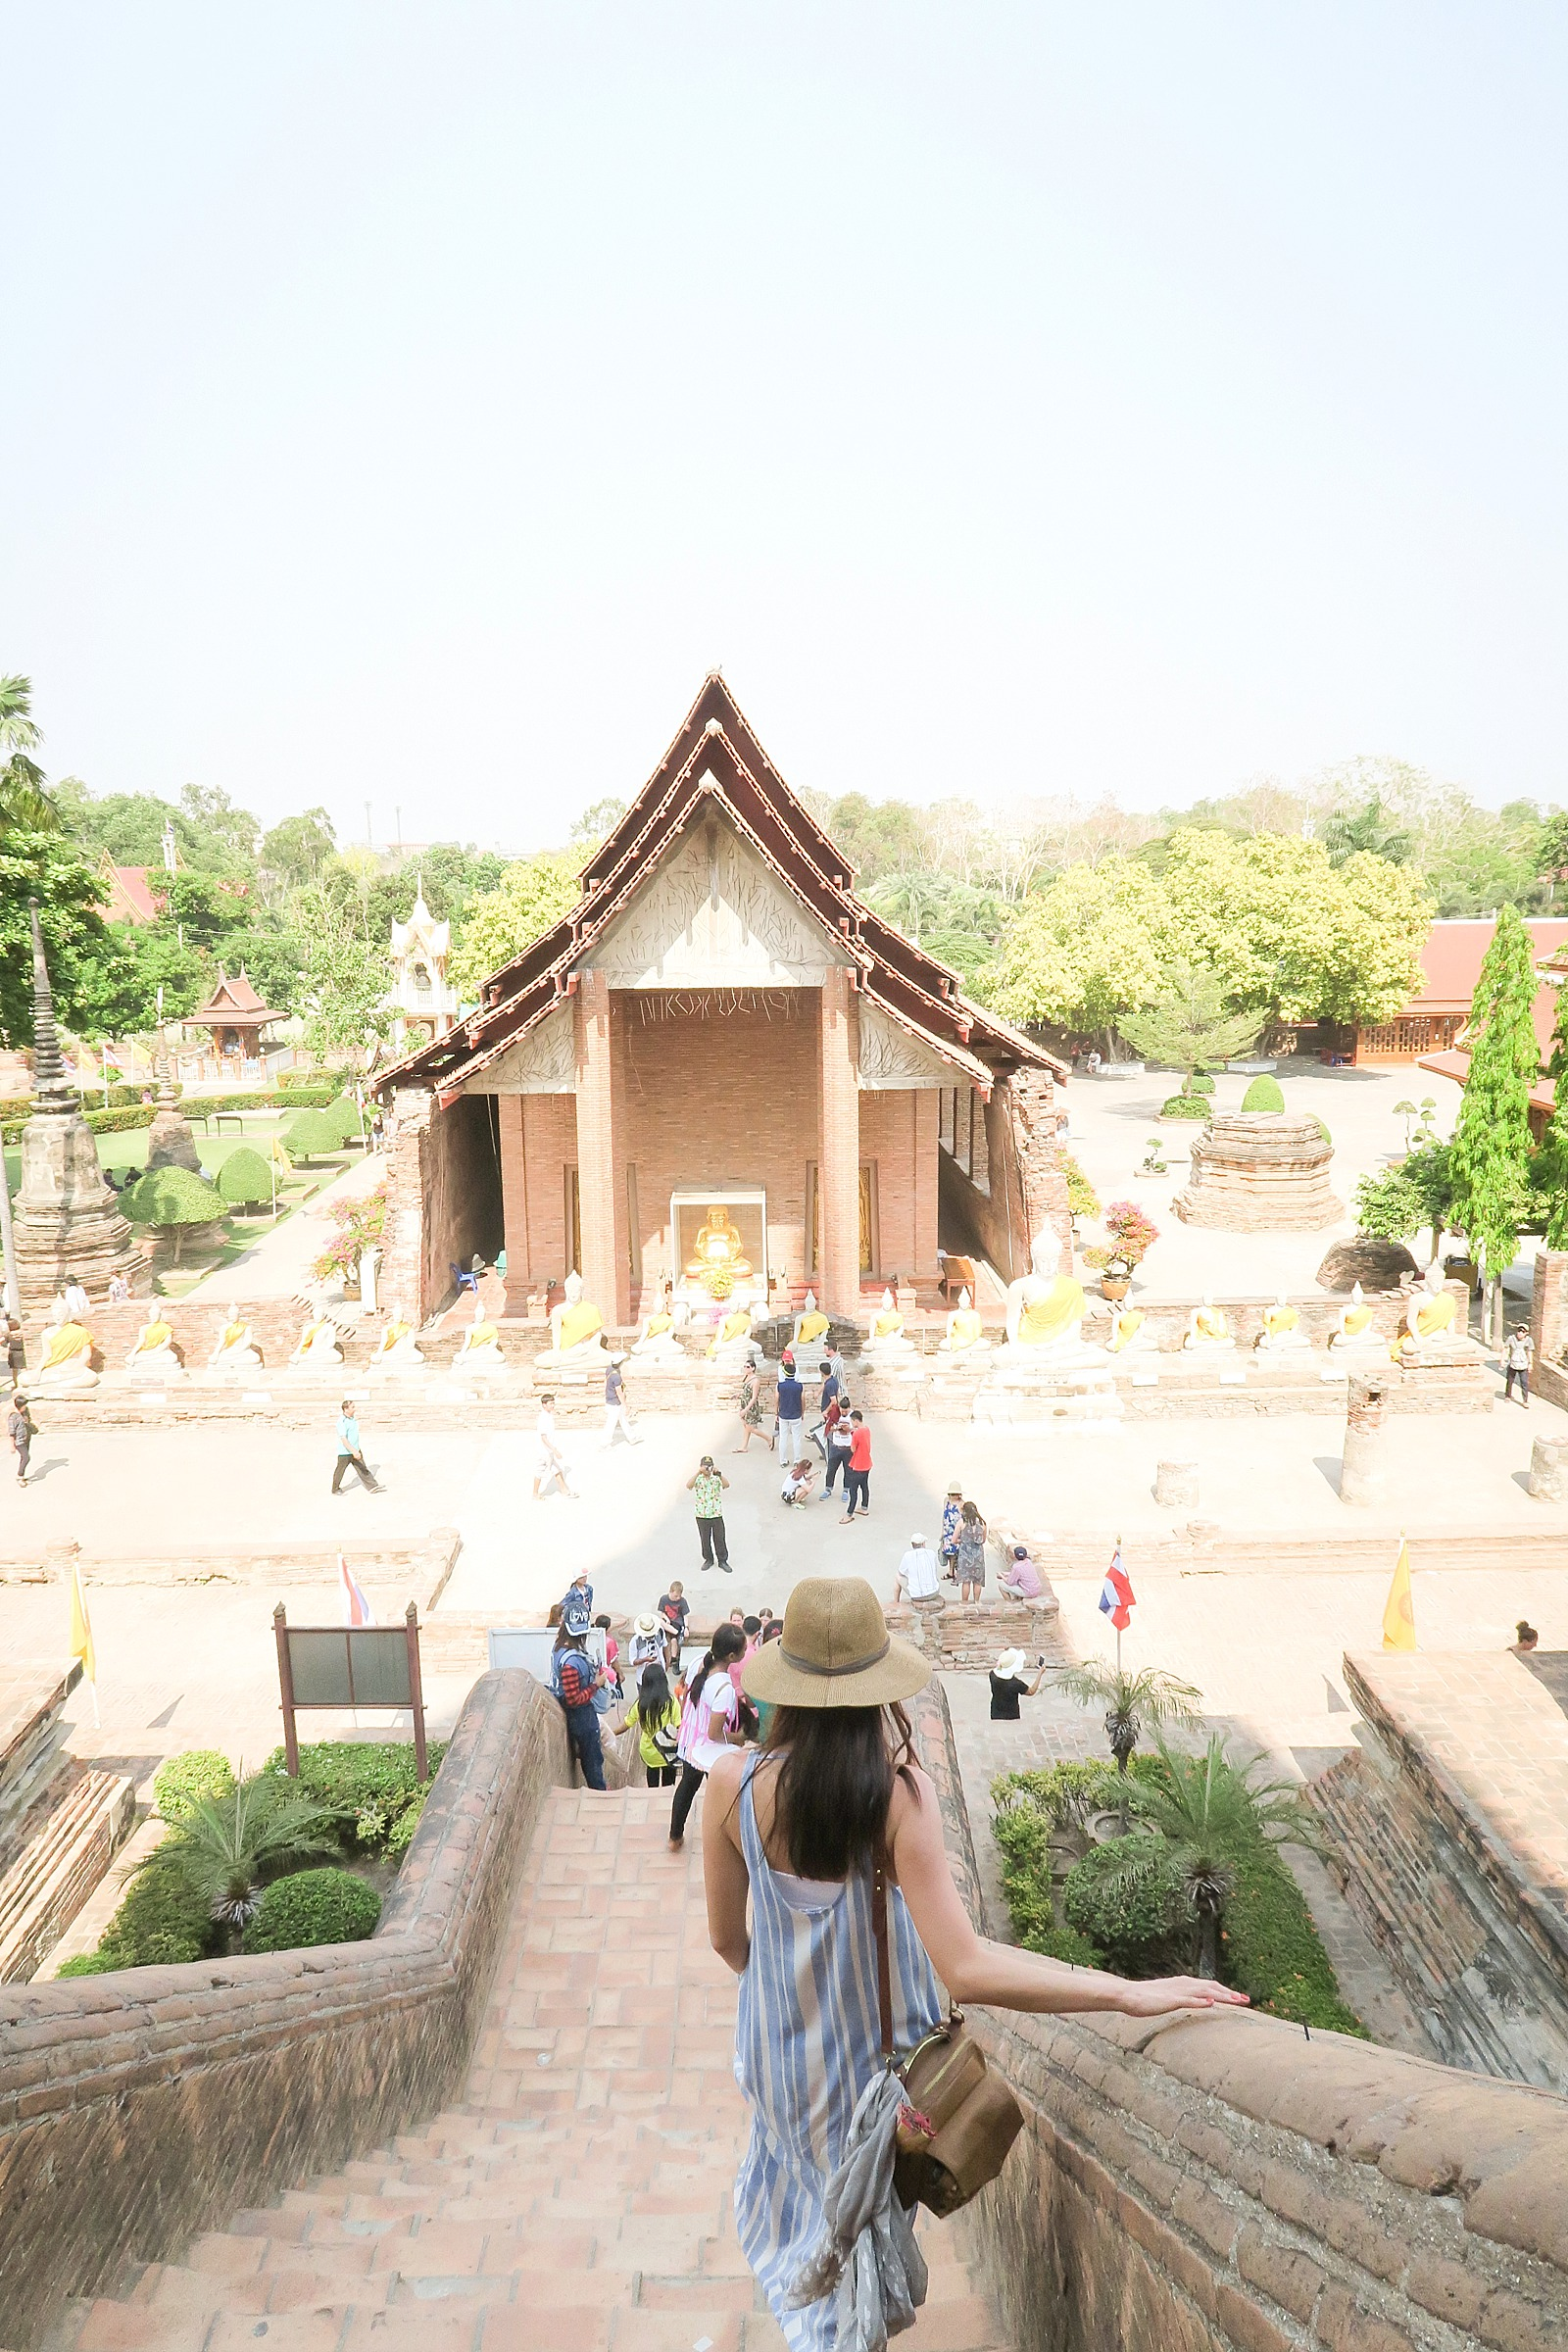 Thailand-diana-elizabeth-travel-blogger-phoenix-337